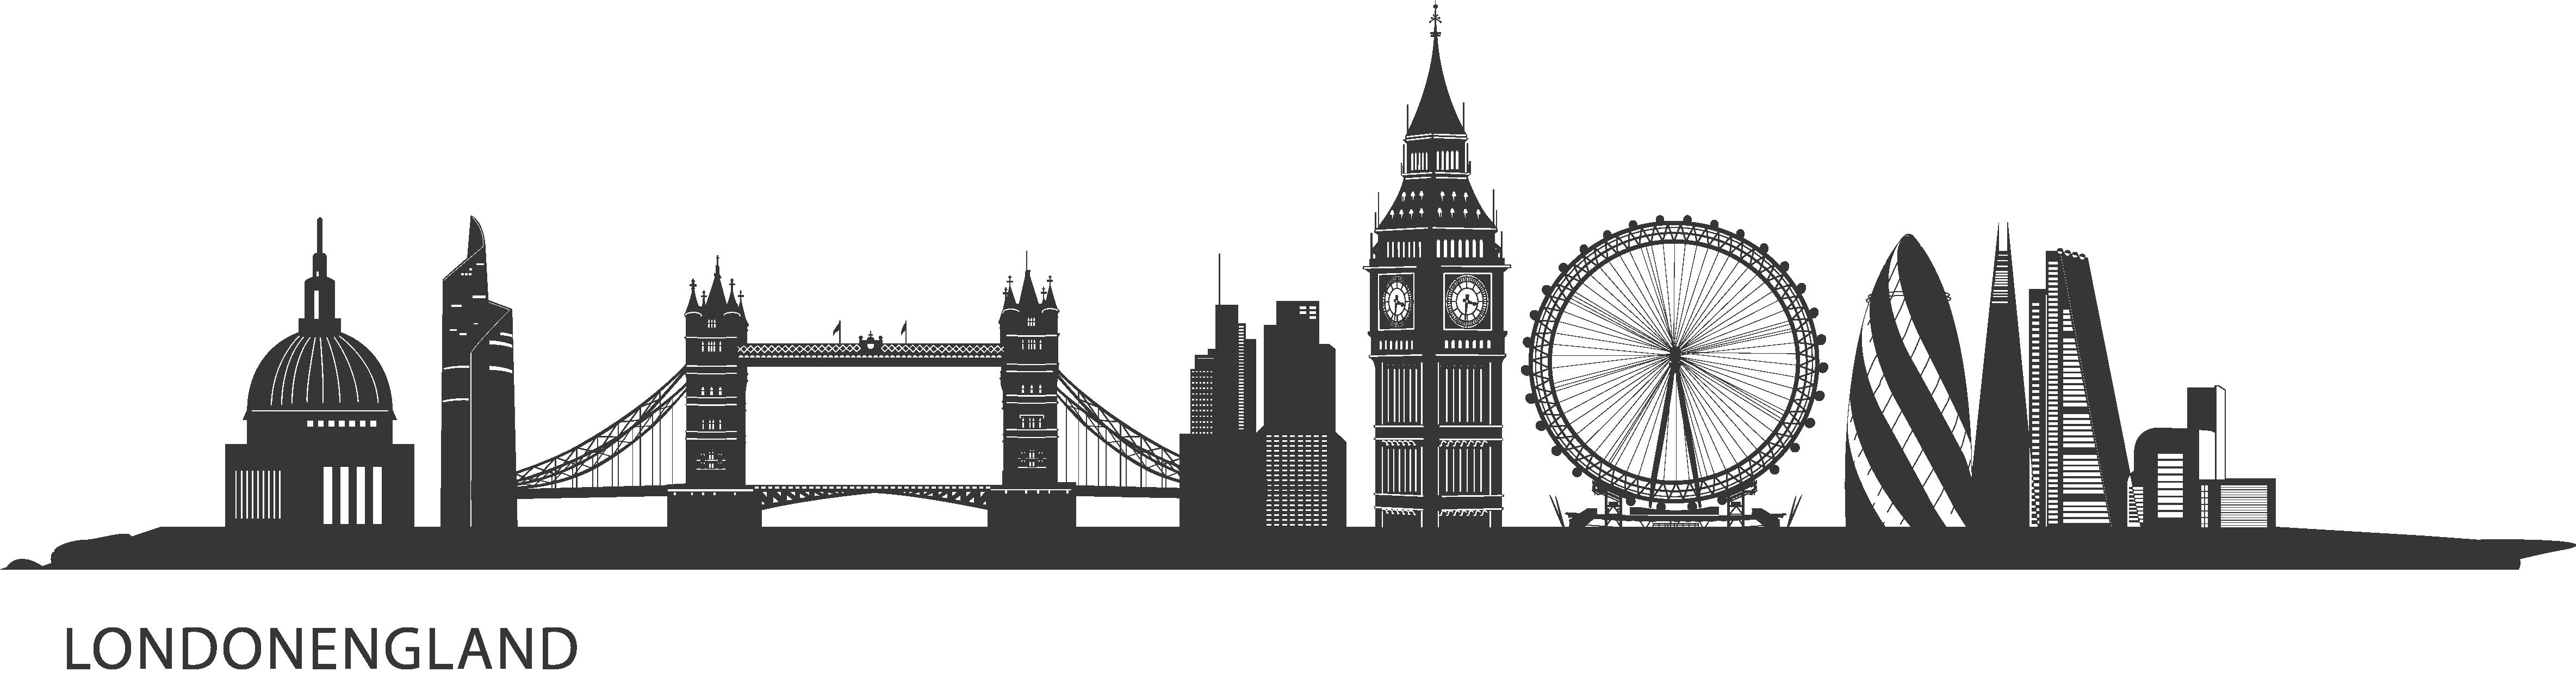 Skyline clipart skyline london. Central silhouette painting city